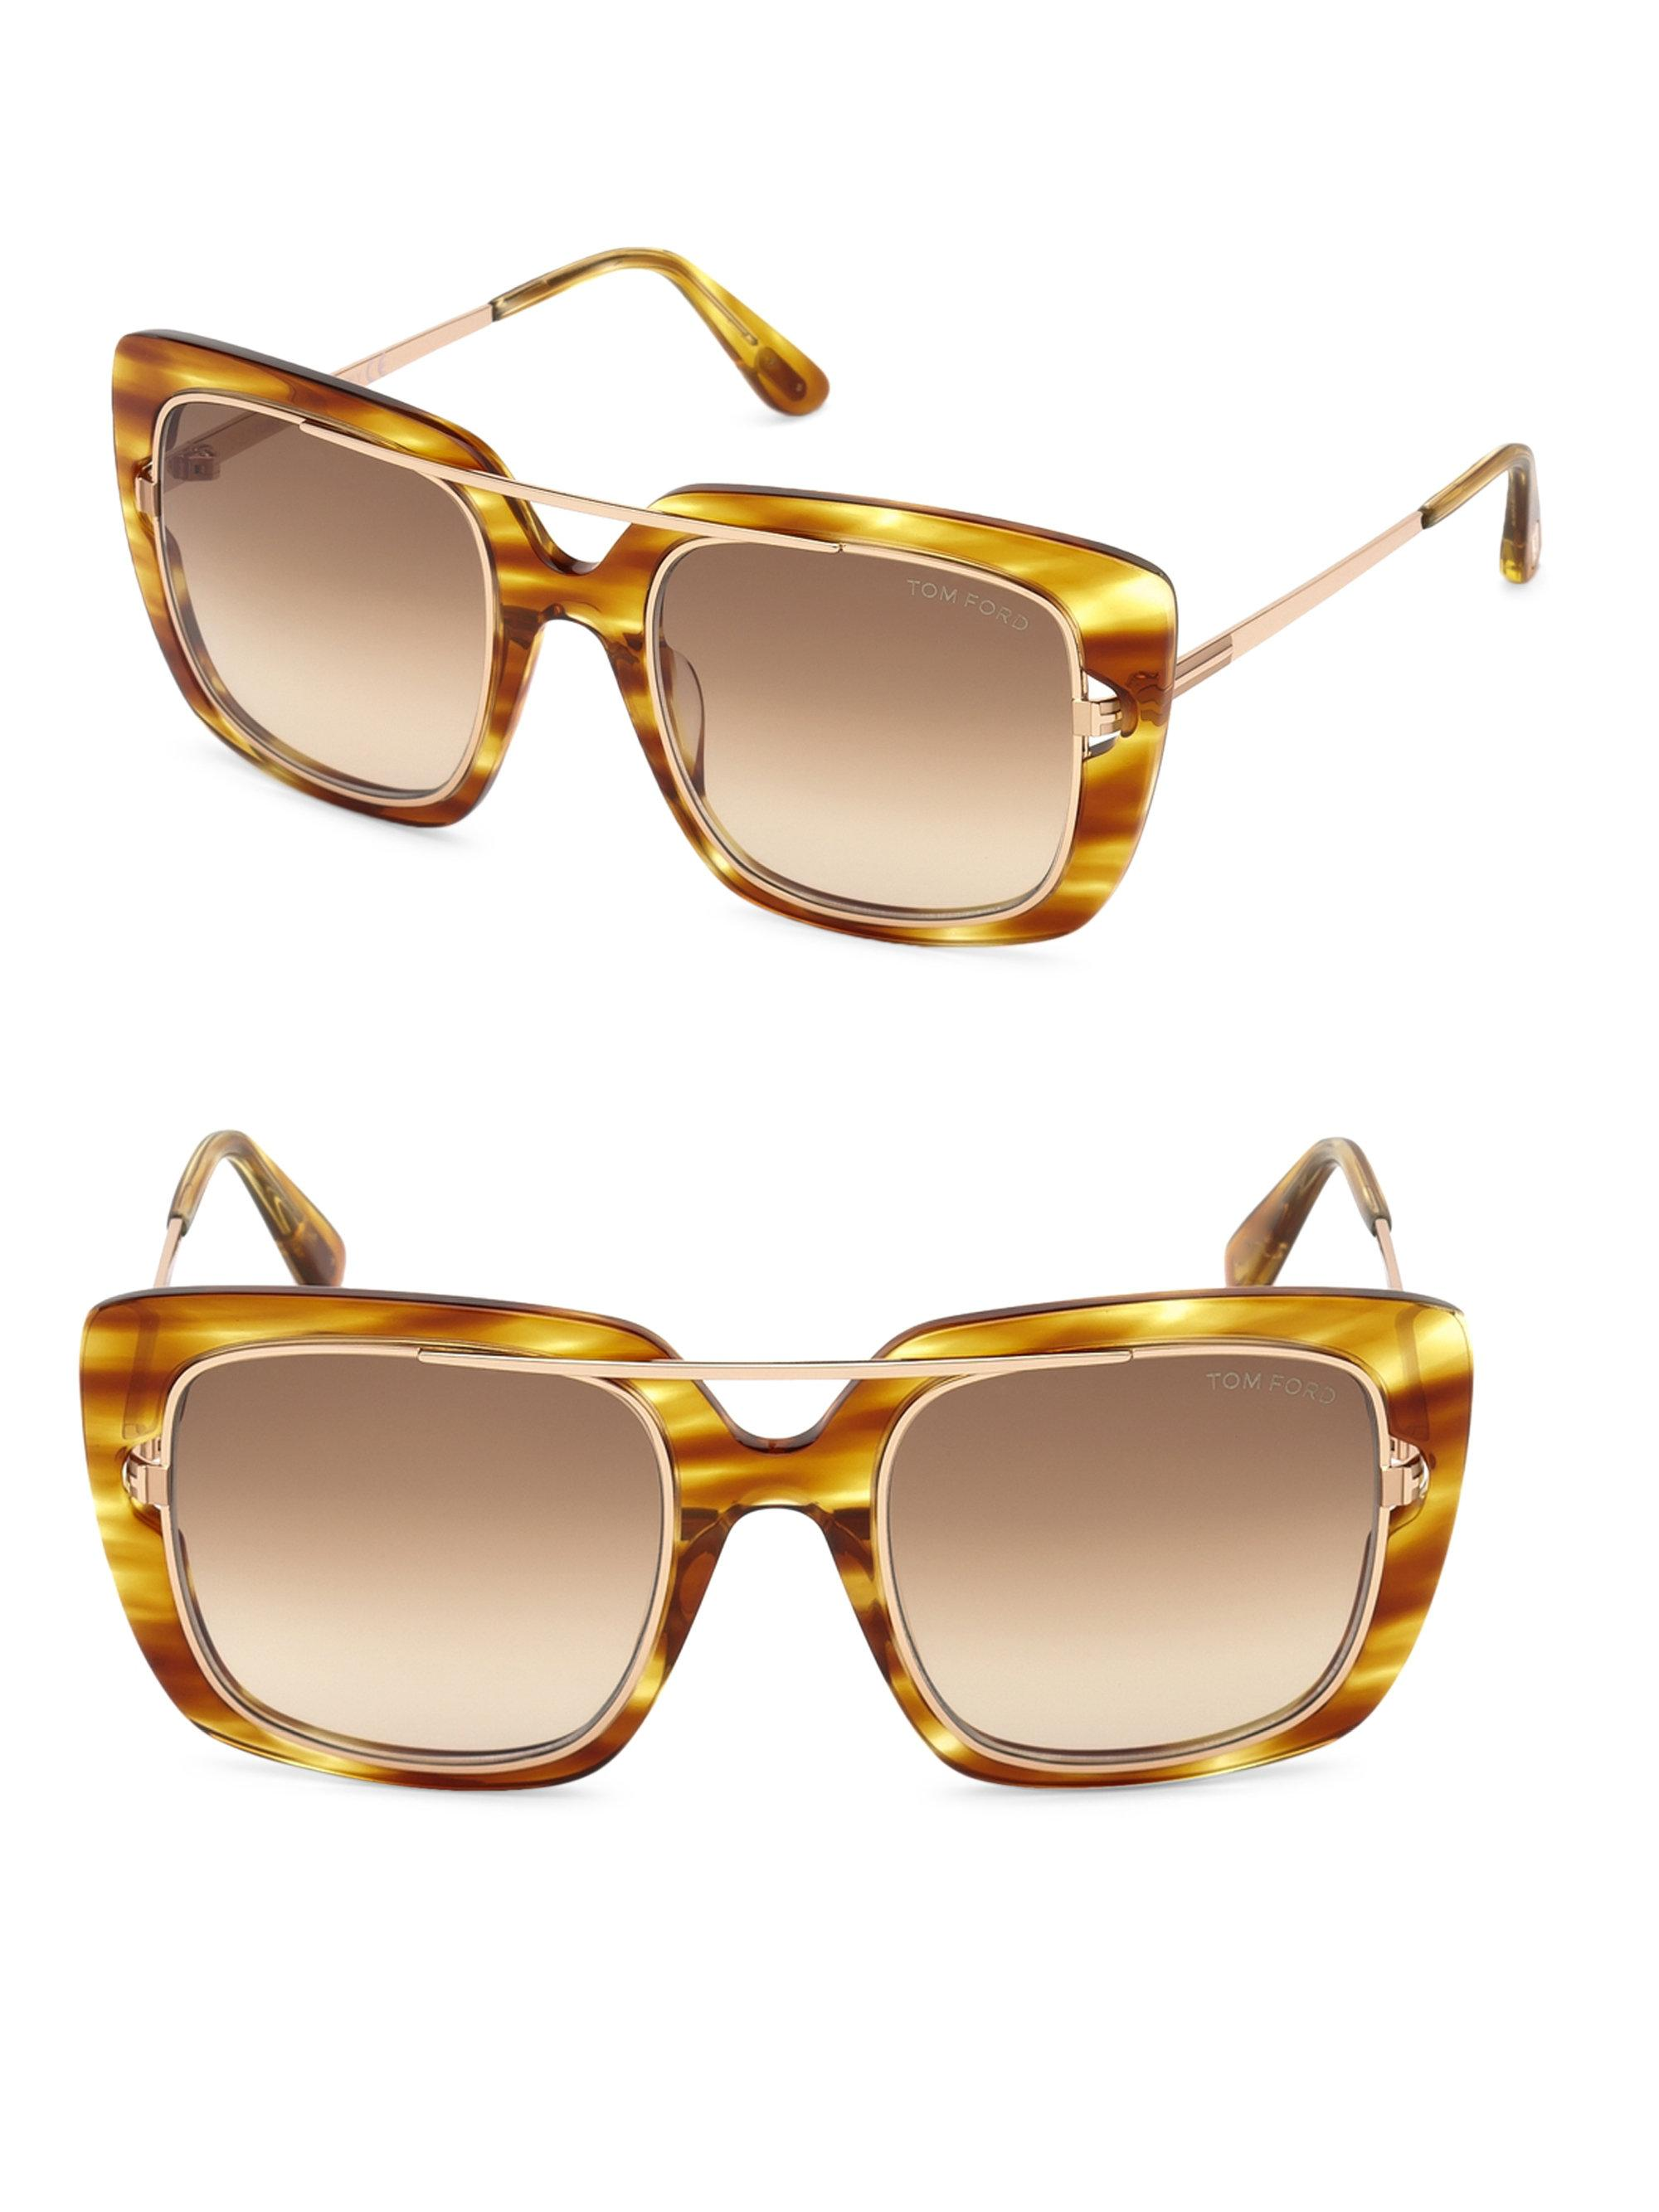 Tom Ford Sonnenbrille Marissa B0JyXj